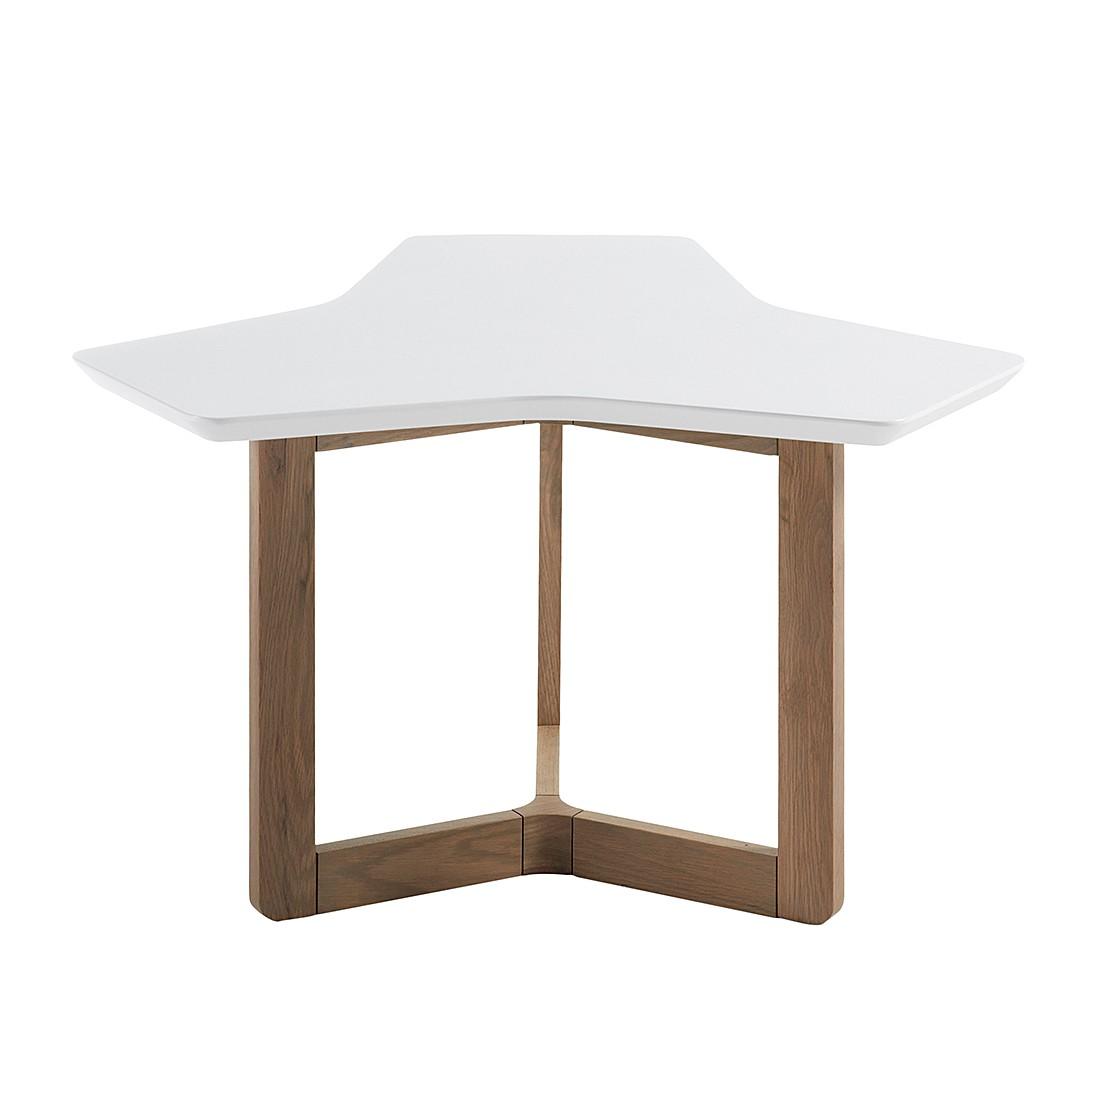 Table d'appoint Solberga - Blanc mat / Chêne, Morteens